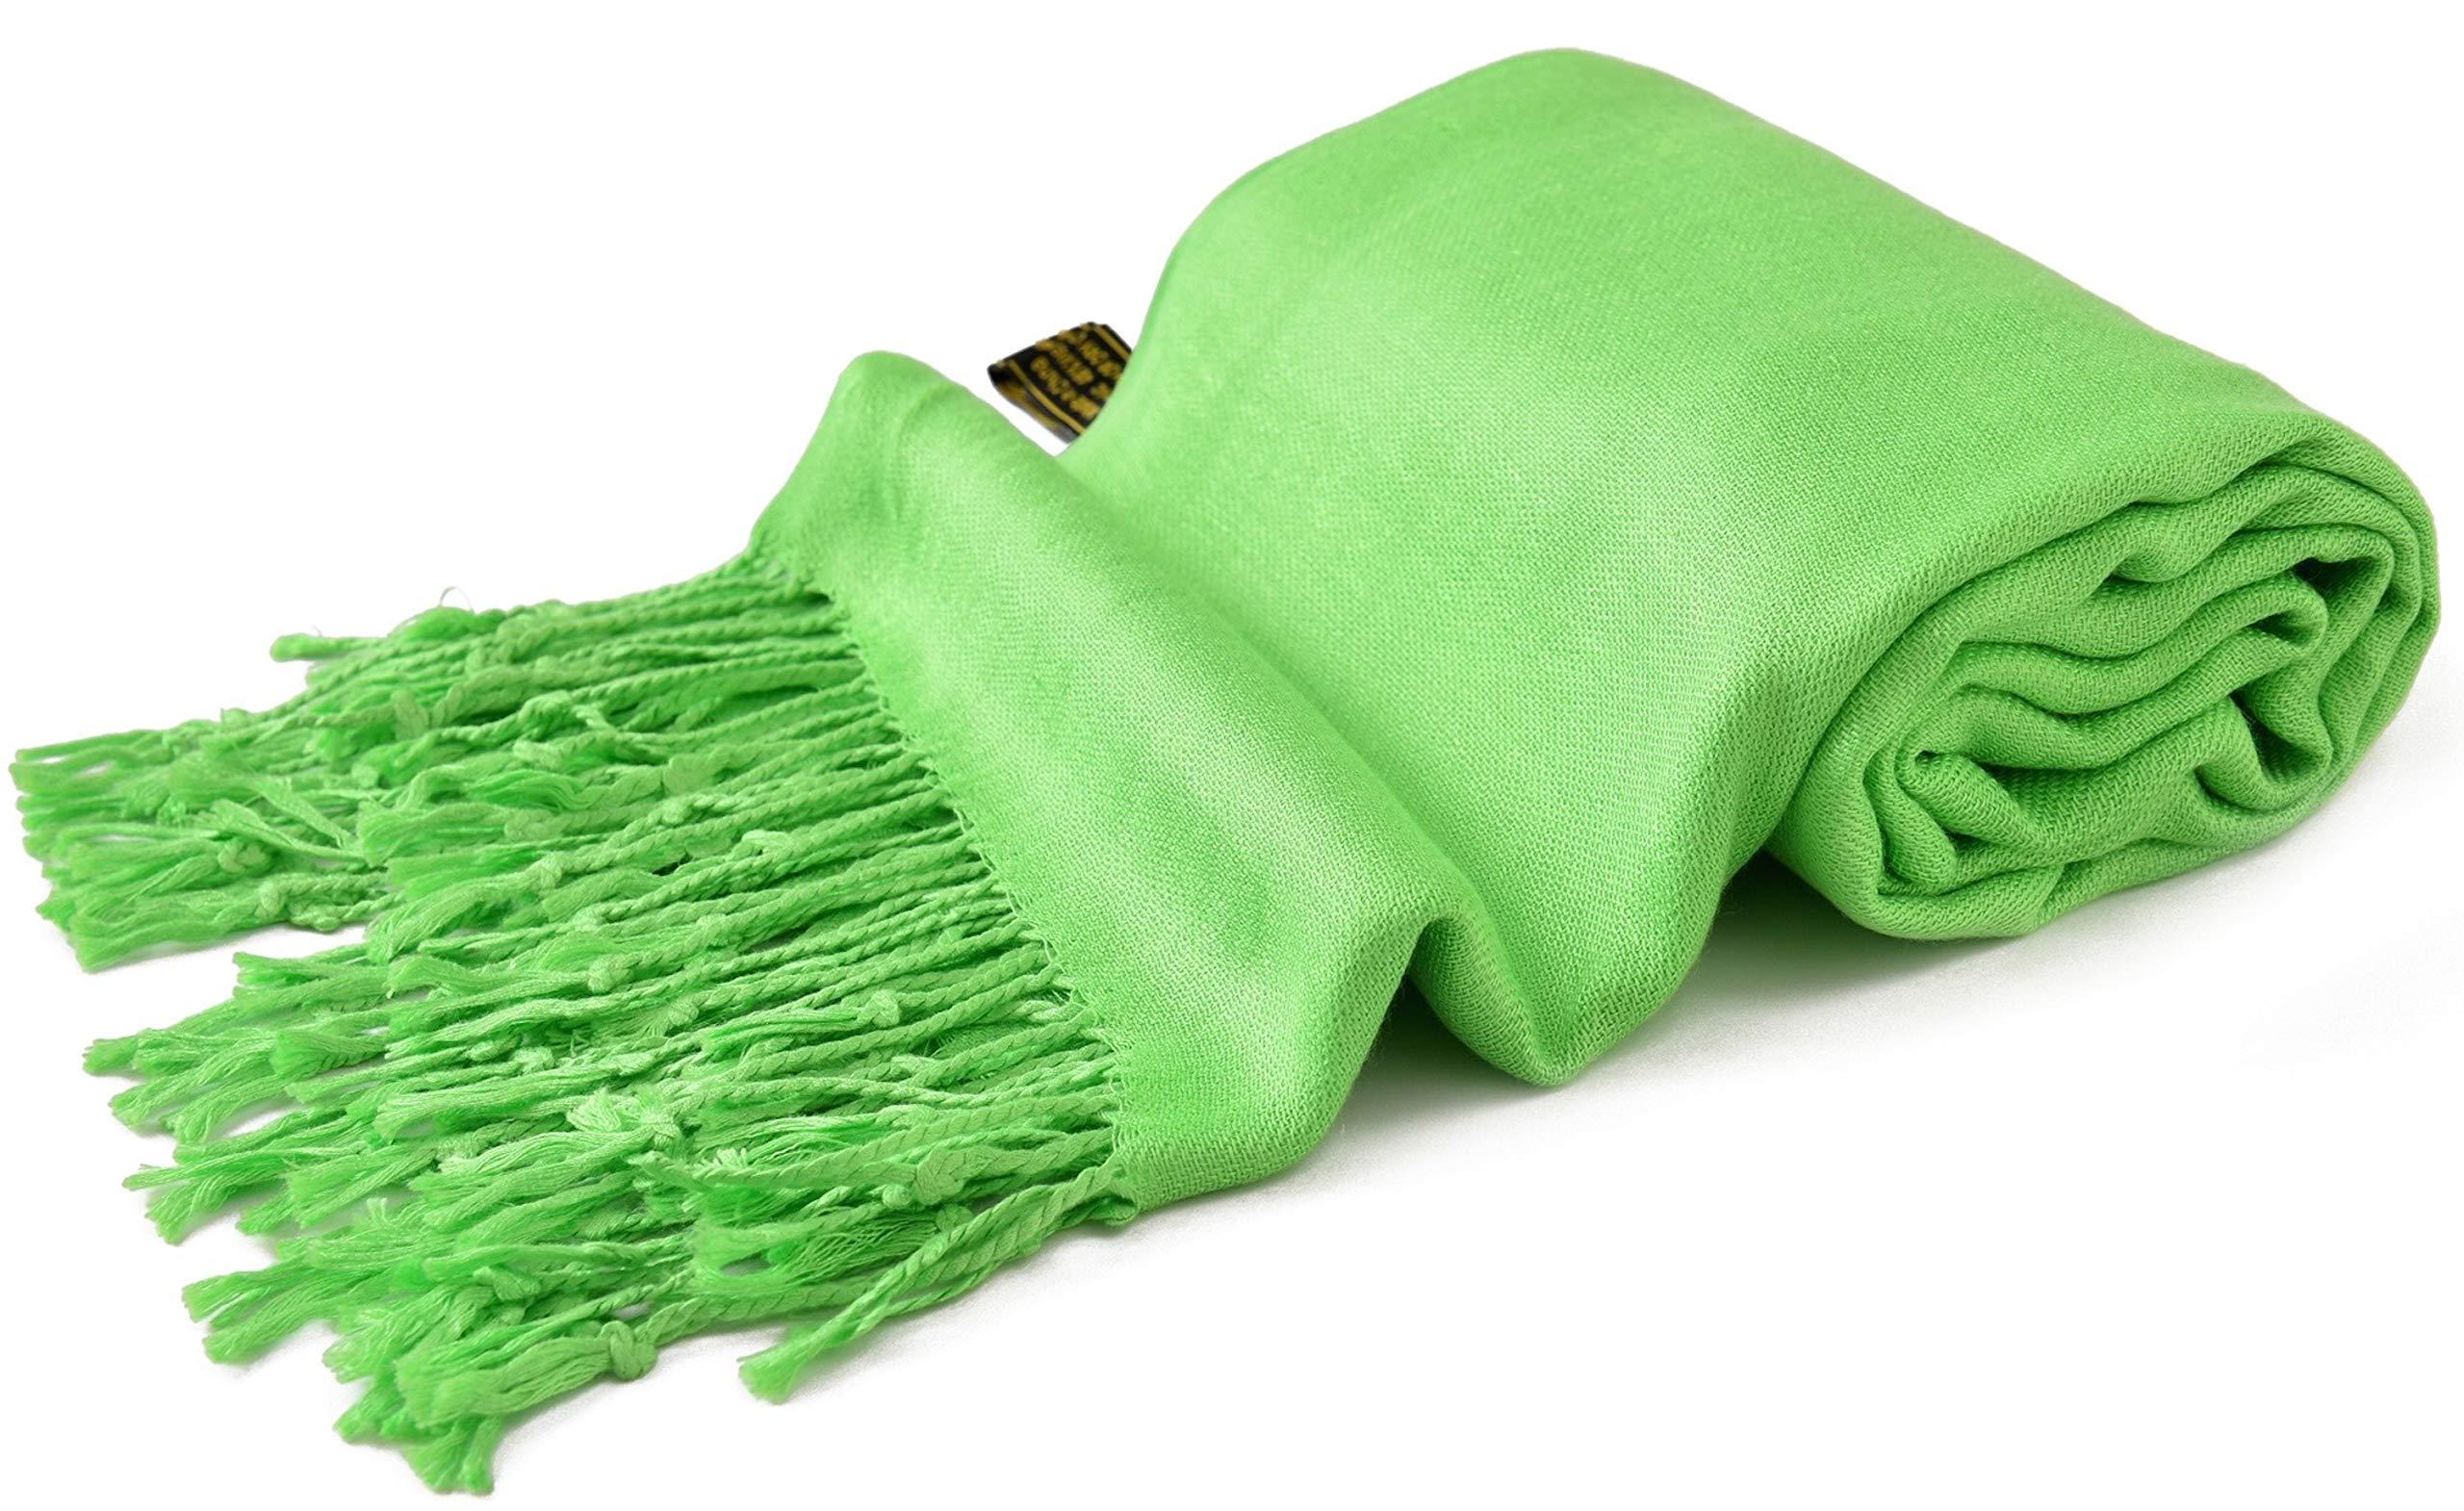 CJ Apparel Royal Blue Solid Colour Design Shawl Scarf Wrap Pashmina Seconds NEW